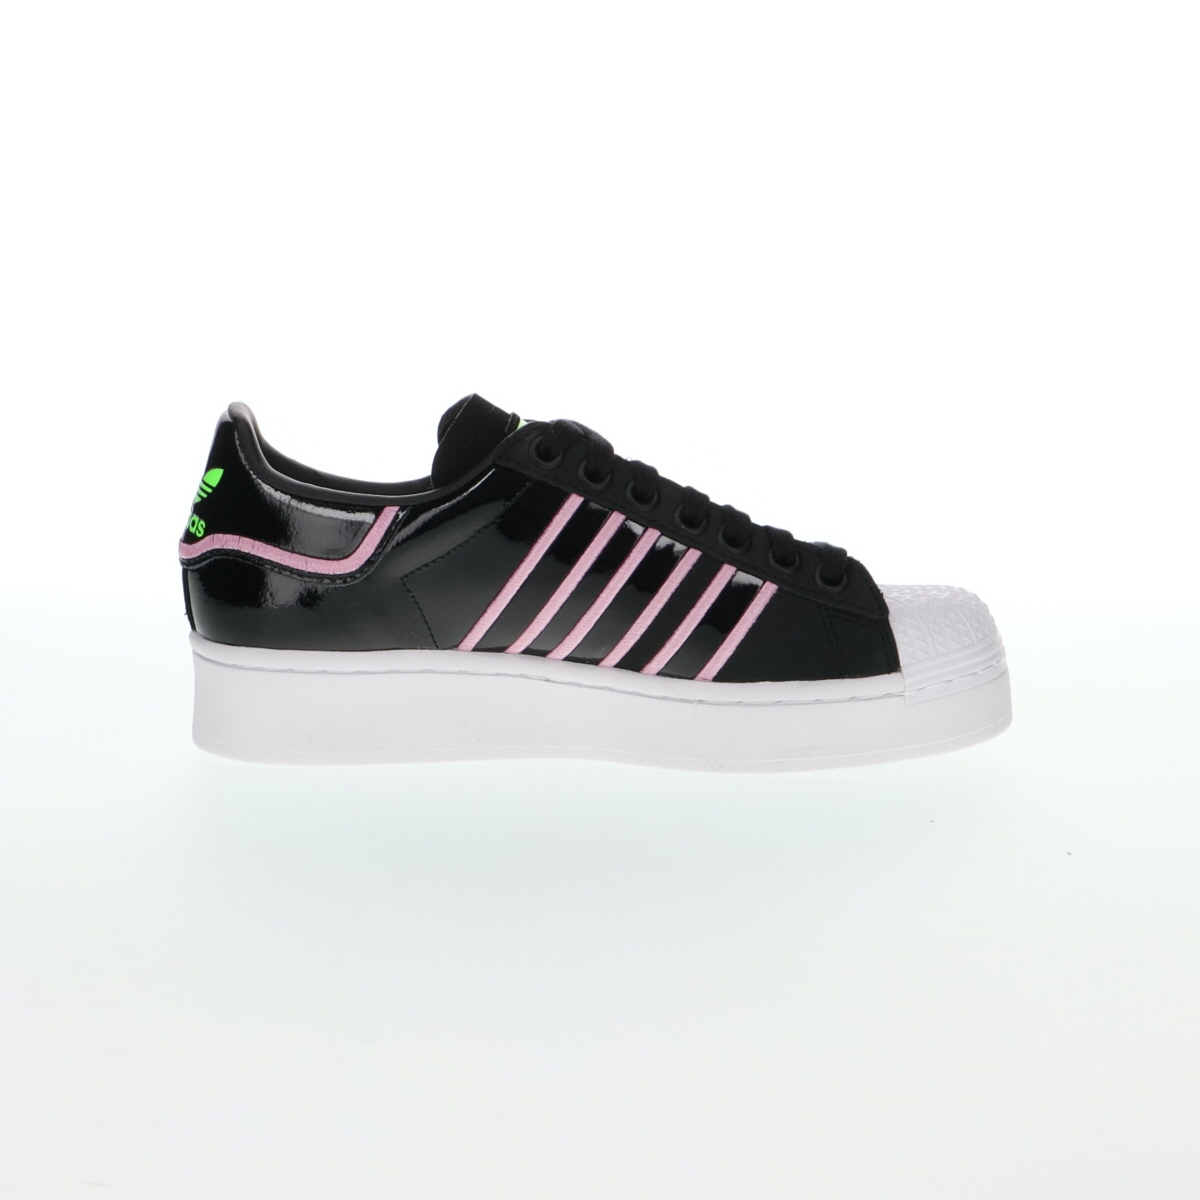 popular adidas shoes 2016 dhgate